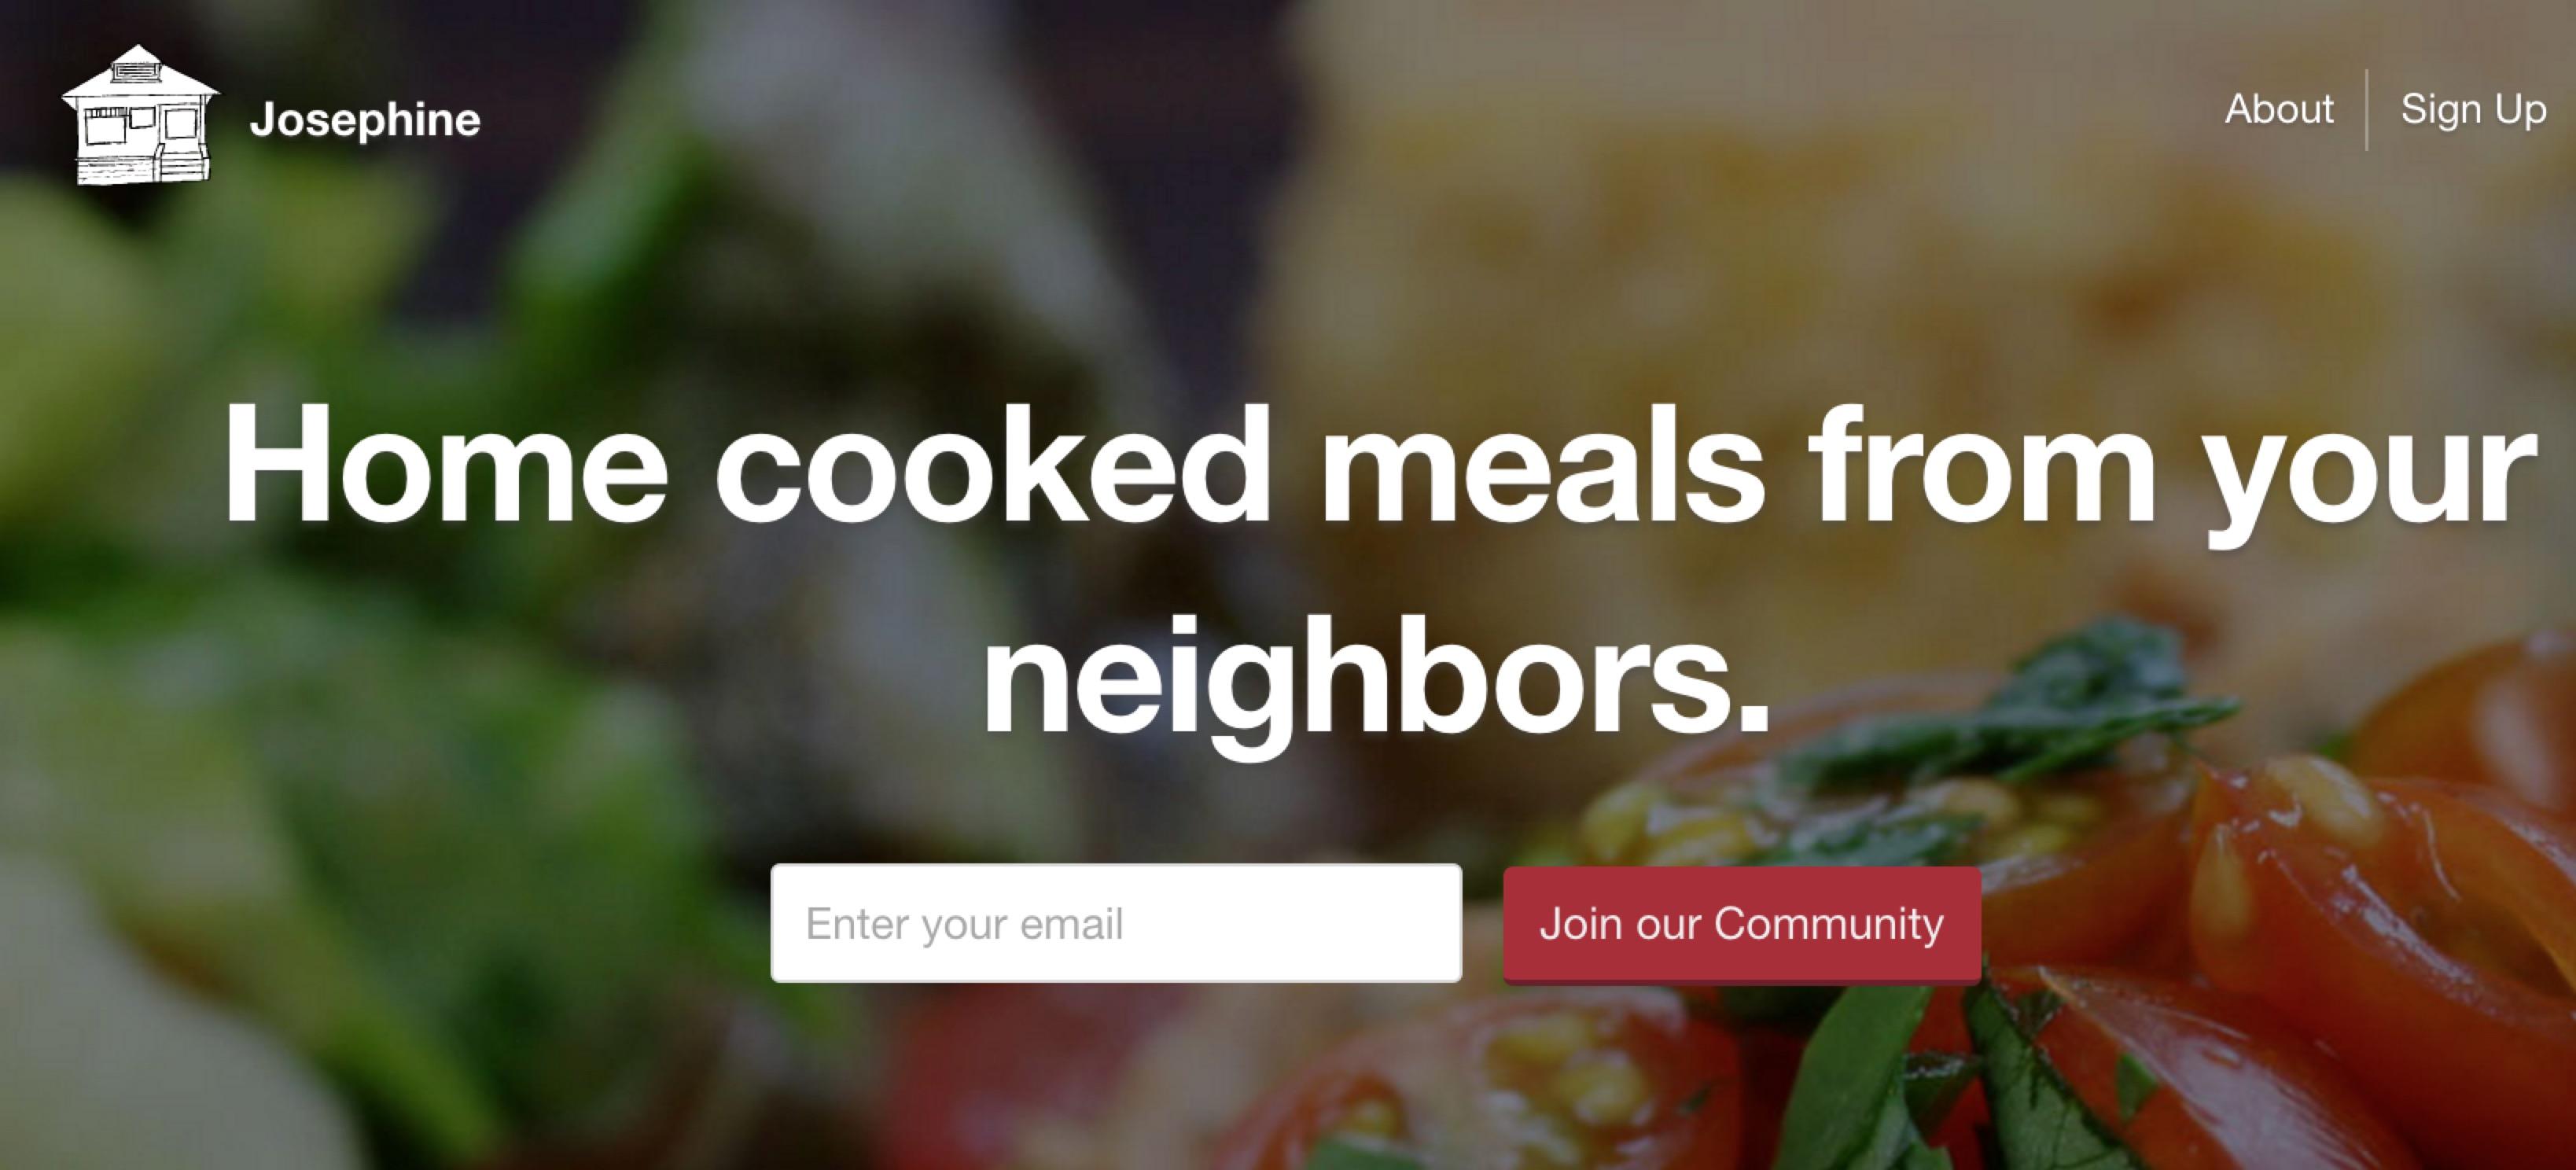 Josephine 的口号:在邻居家吃得到的家常菜。